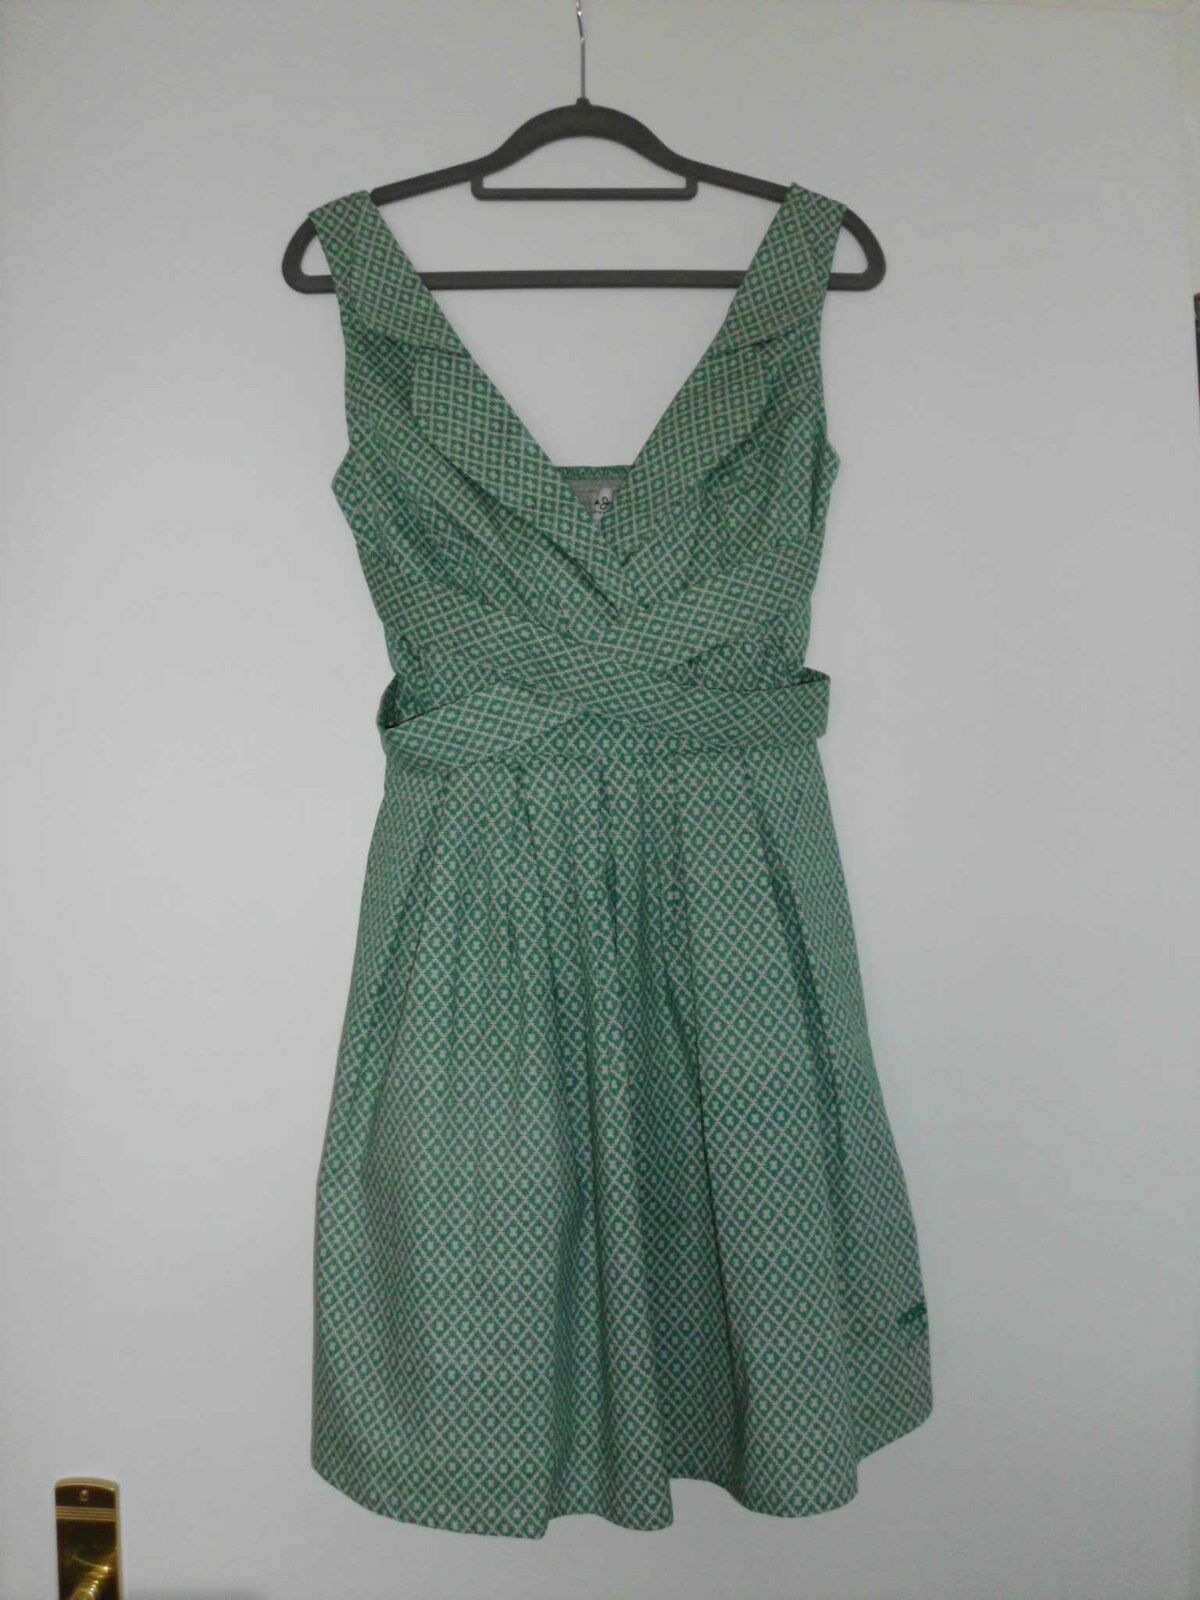 Pepe Jeans London Kleid Jill jade grün creme beige Kragen Bänder Gr. S 36 neu